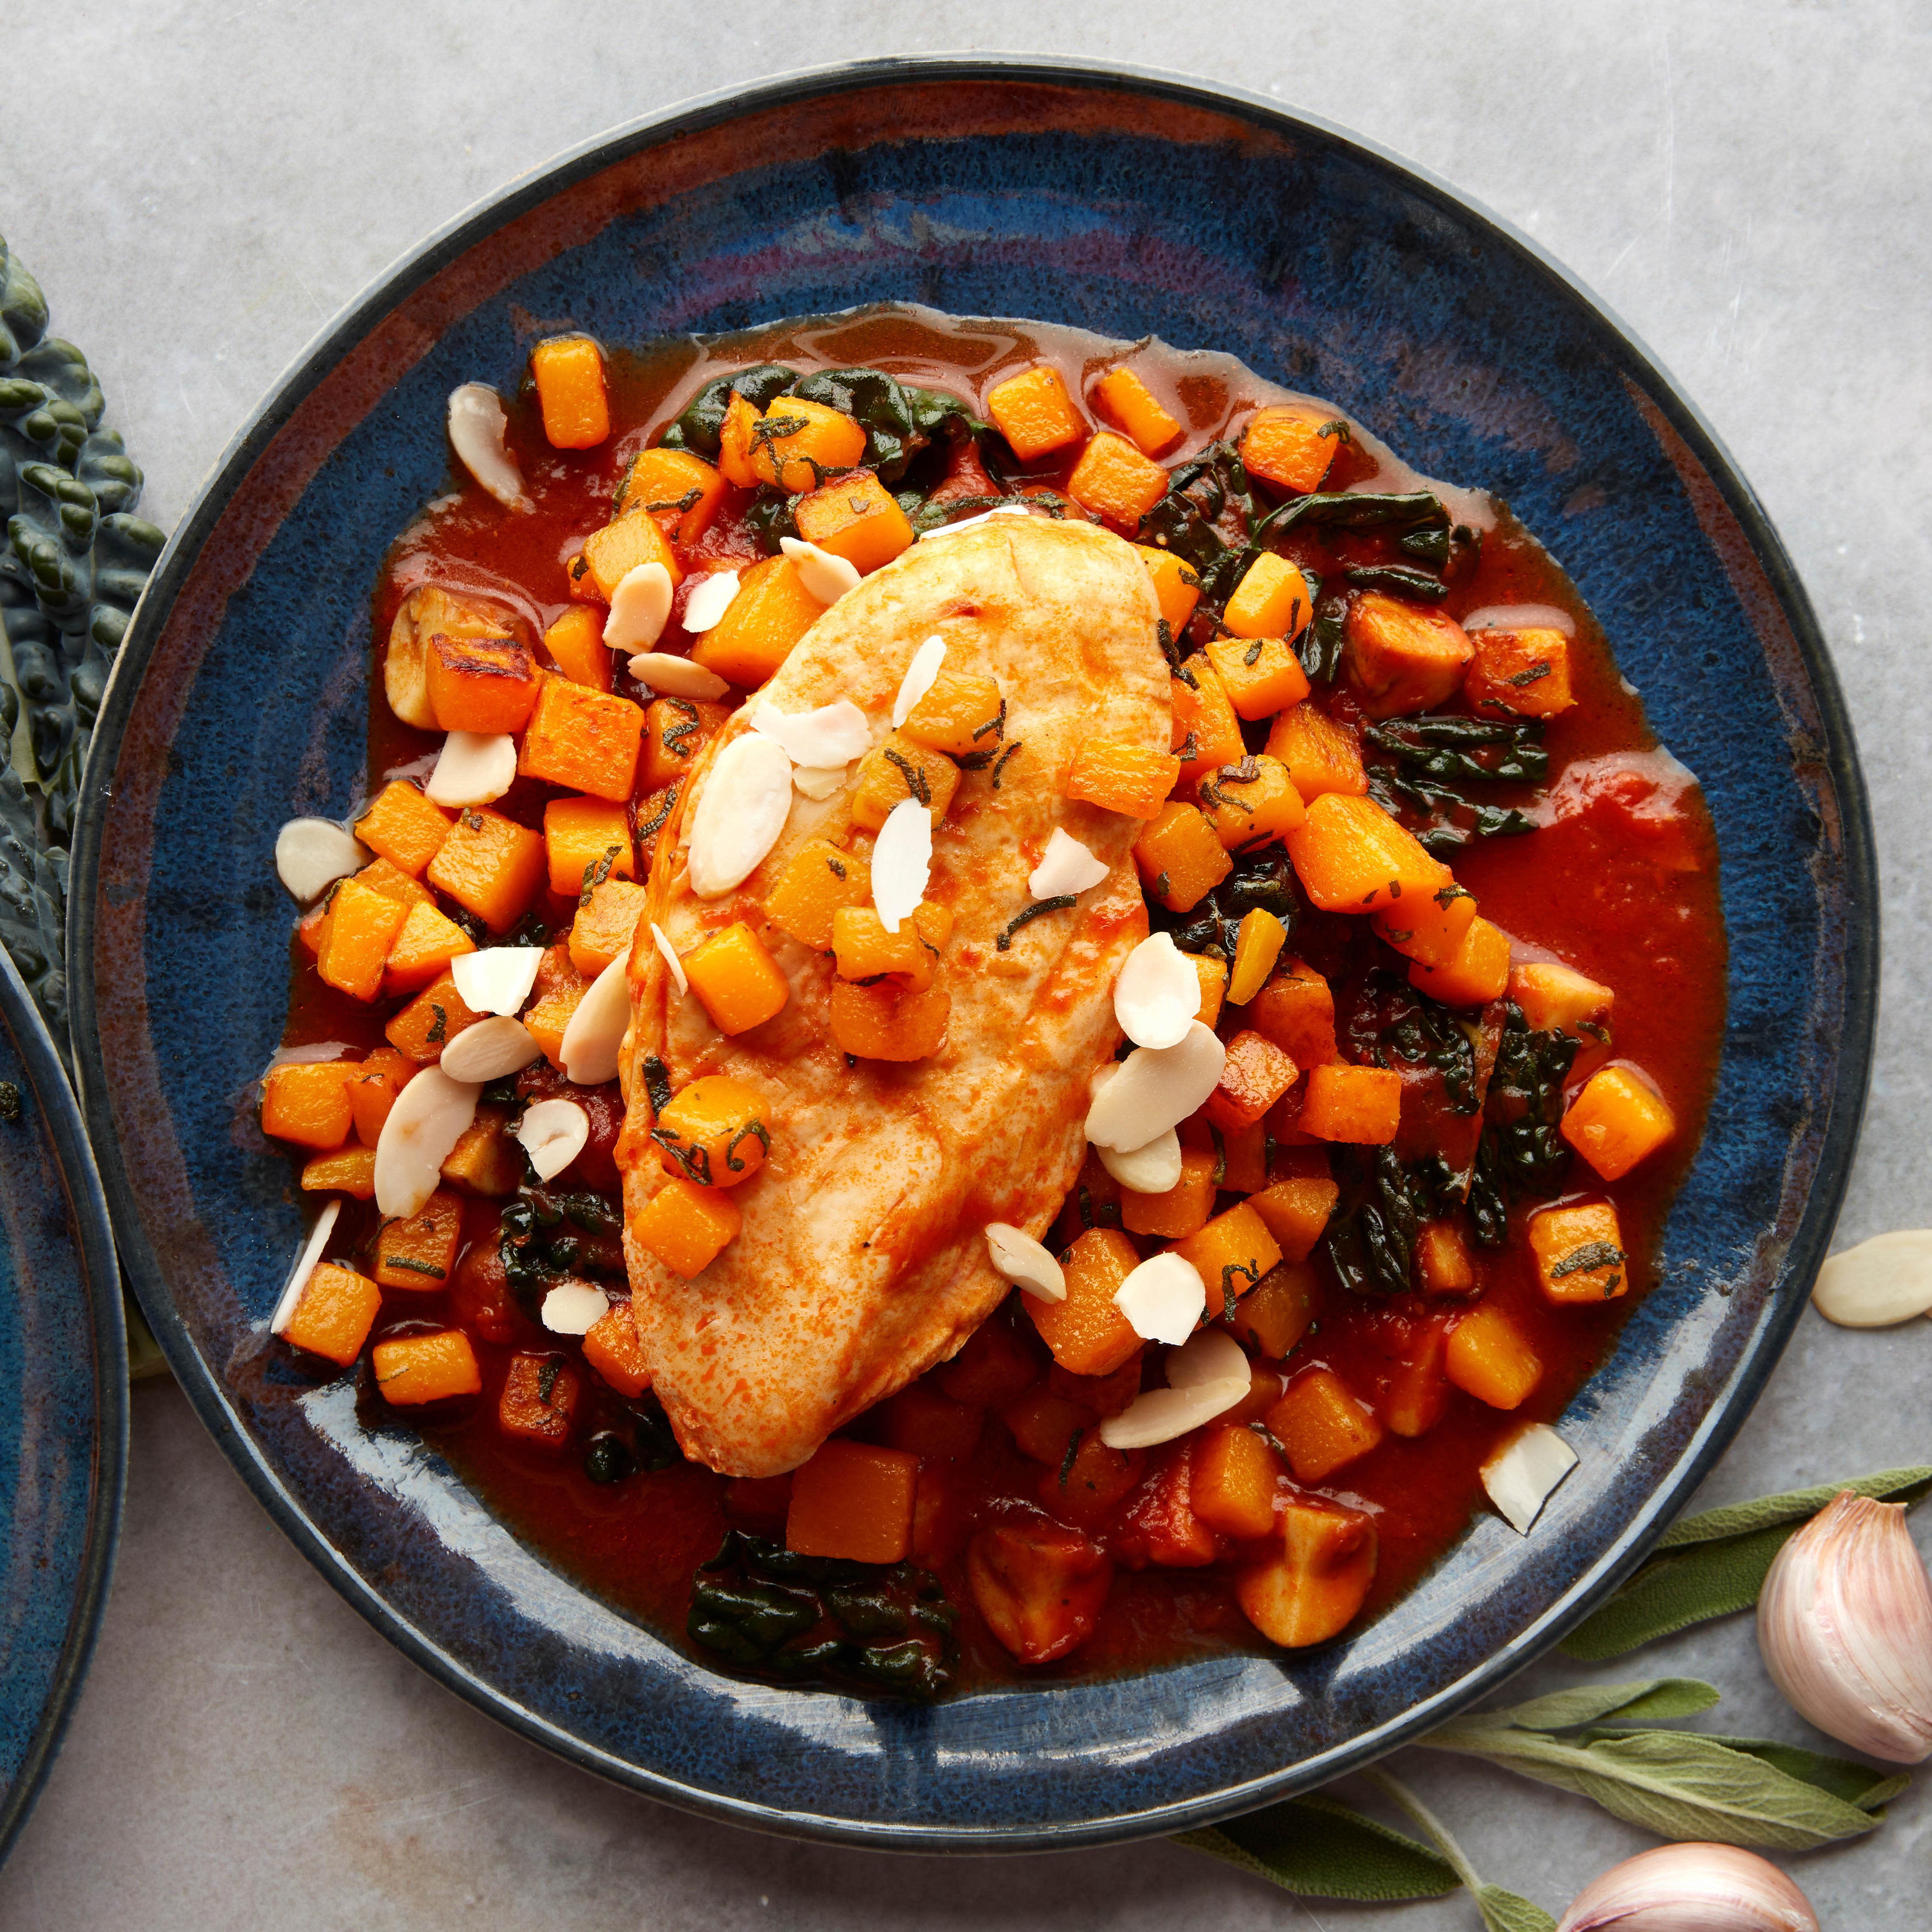 Mindful Chef Chicken Recipe Box, Serves 2